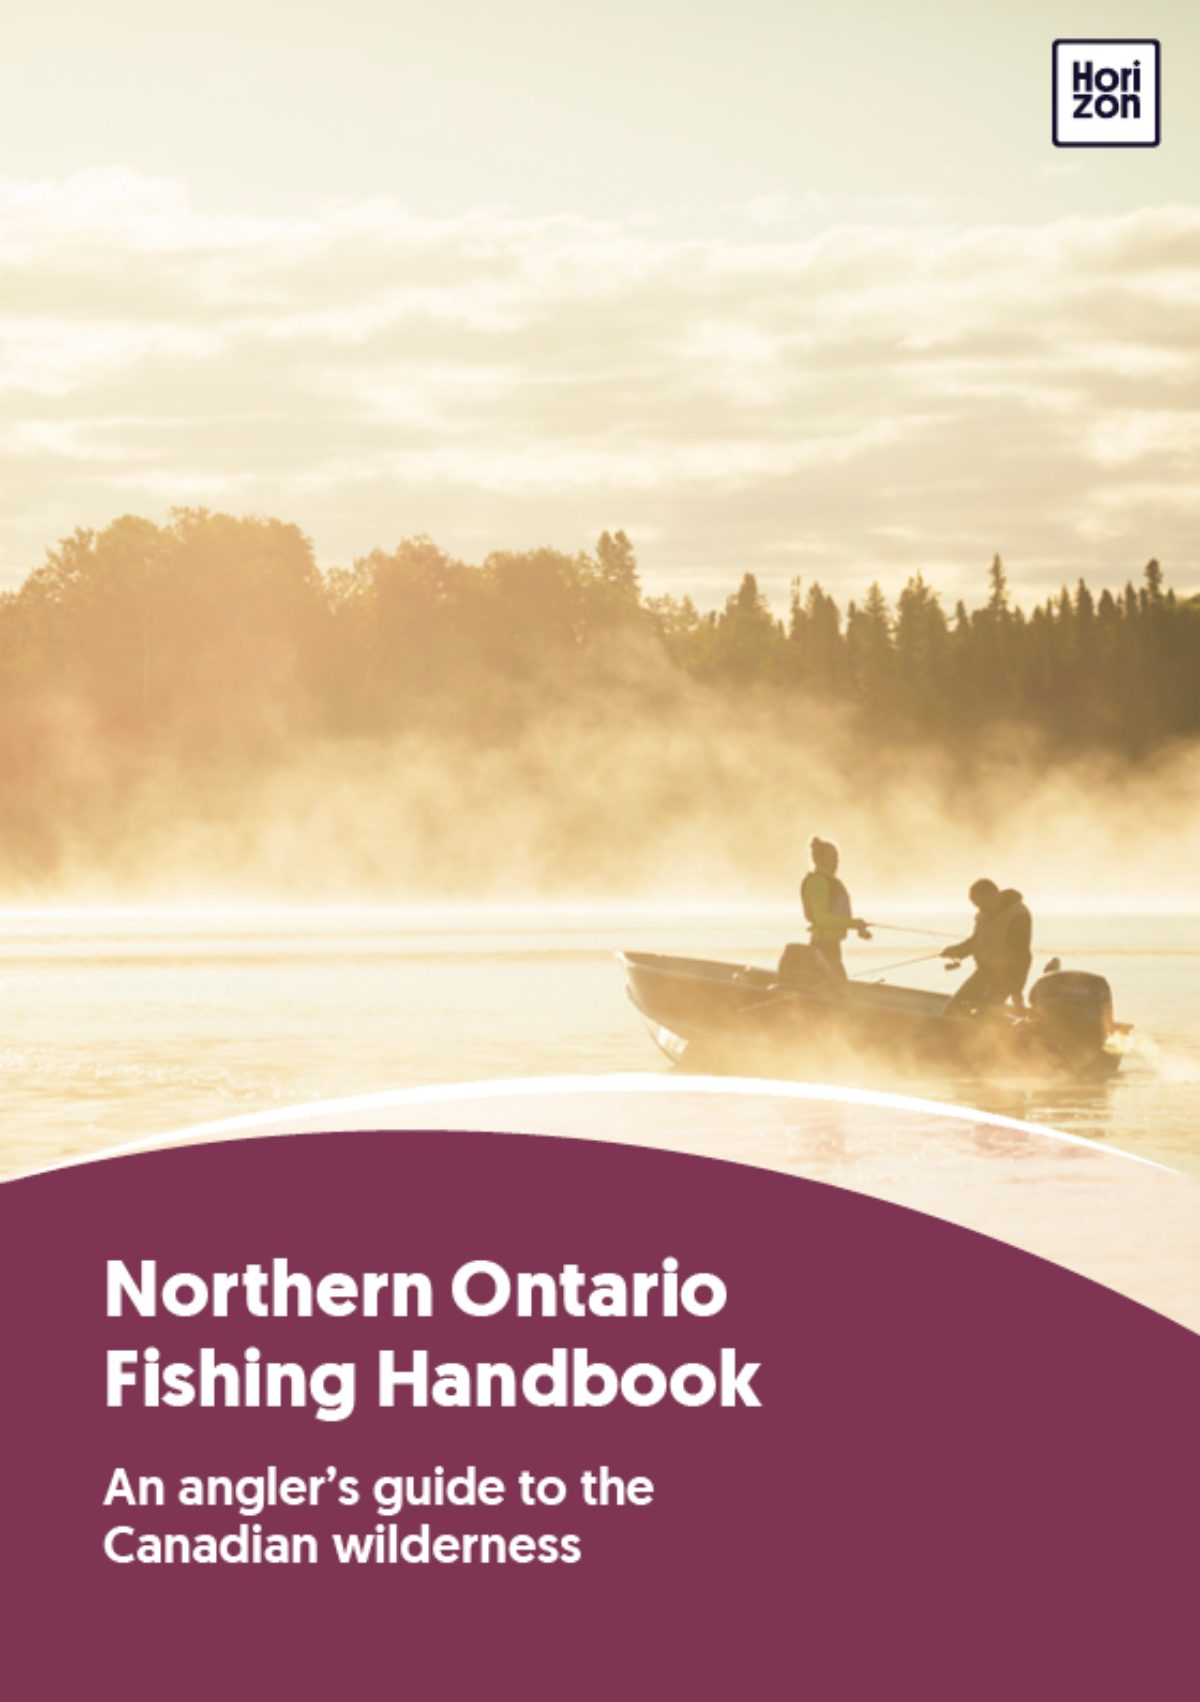 Northern Ontario Fishing Handbook